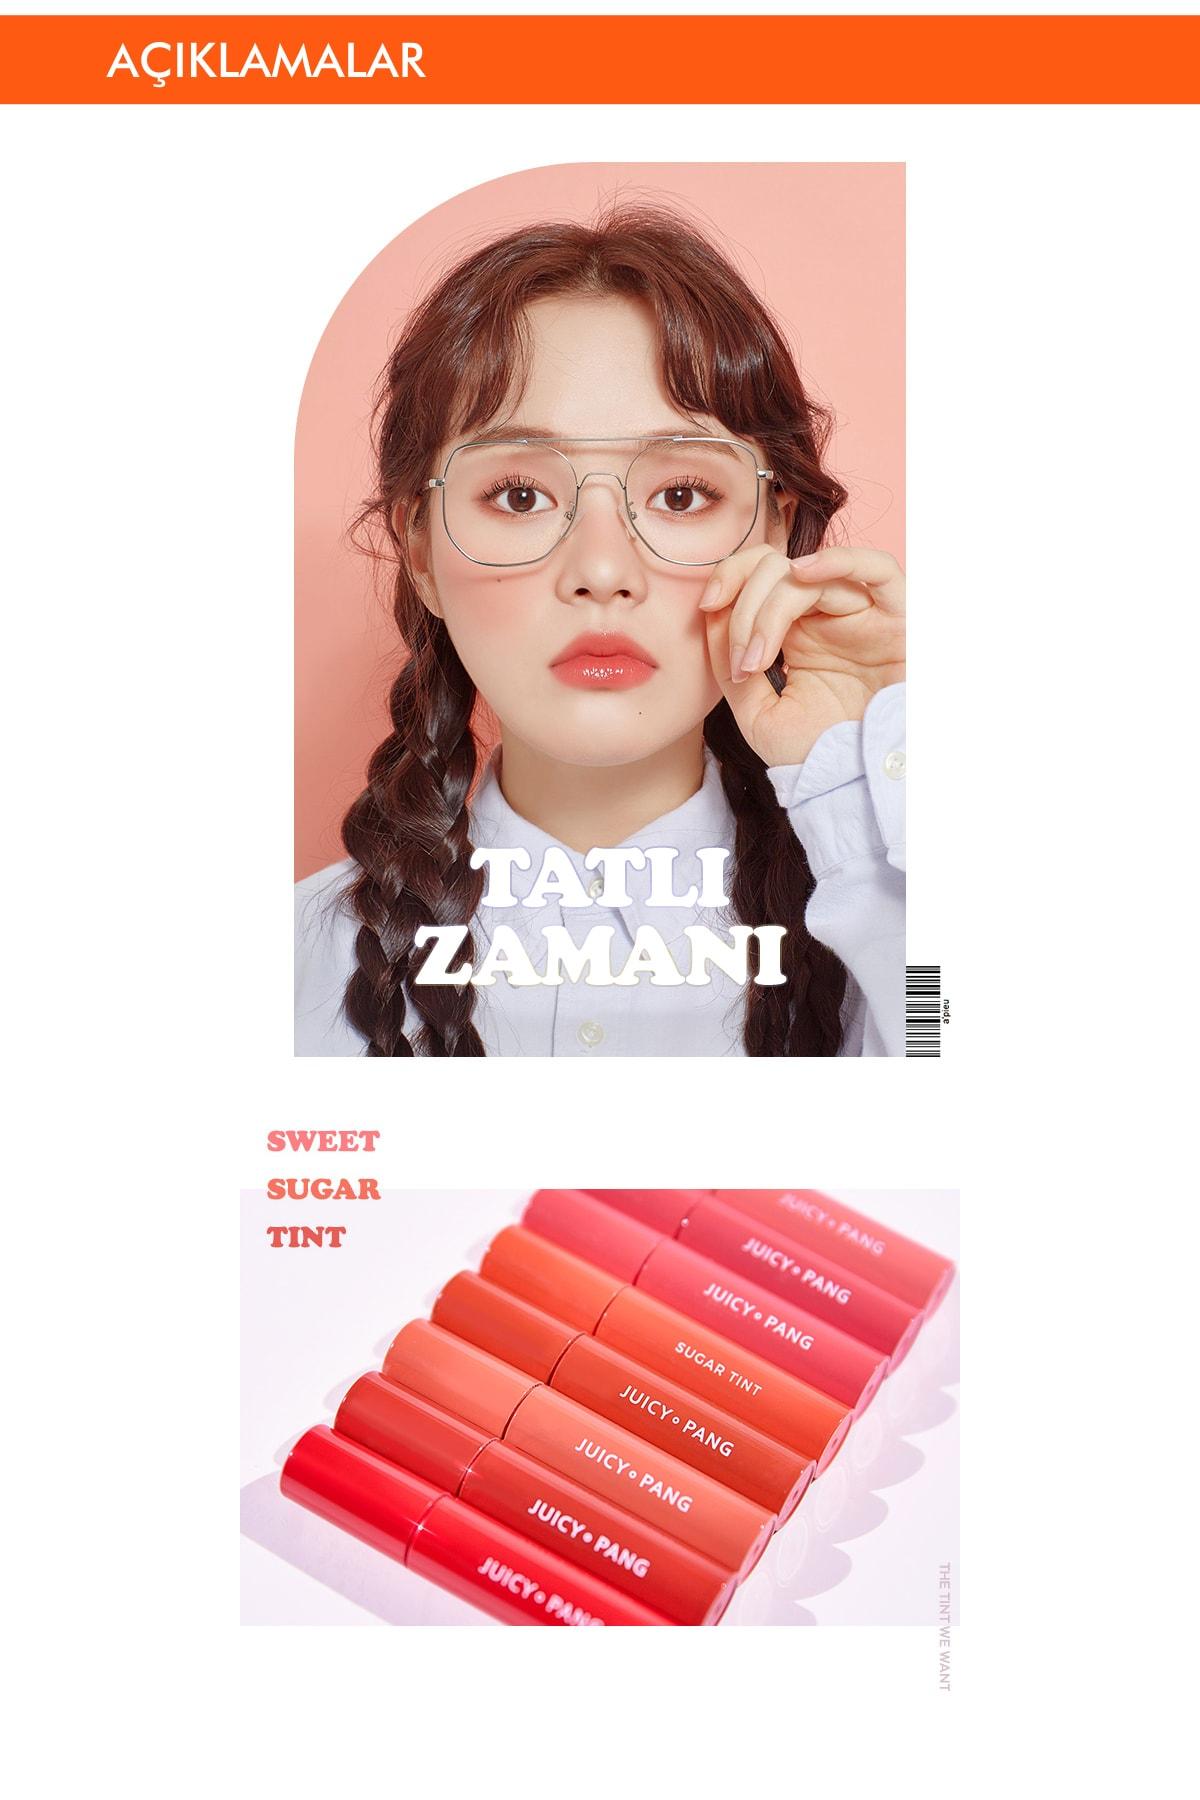 Missha Uzun Süre Kalıcı Parlak Su Bazlı Jel Tint APIEU Juicy-Pang Sugar Tint (CR01) 1